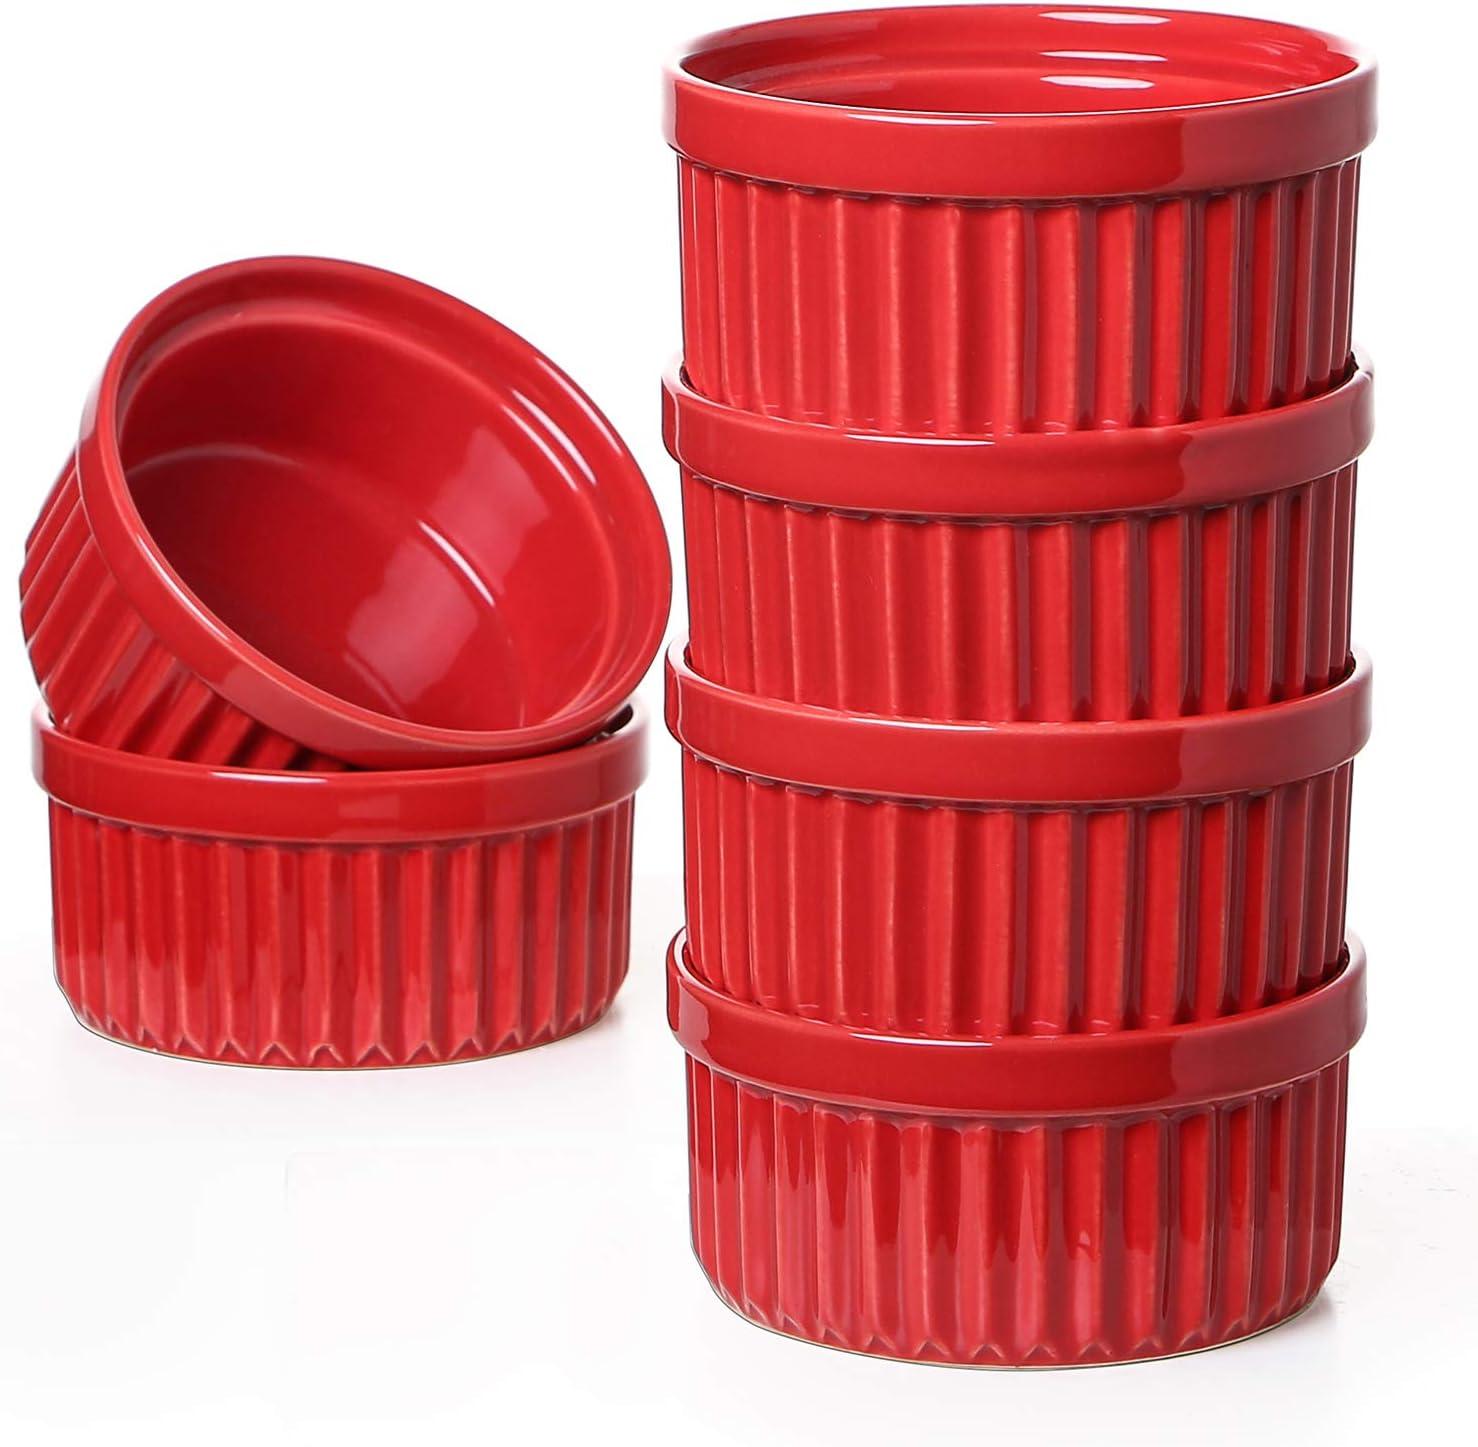 LE TAUCI 8 Oz Ramekins, Souffle Dishes, Ramekin Set for Creme Brulee, Set of 6, Oven Safe, True Red